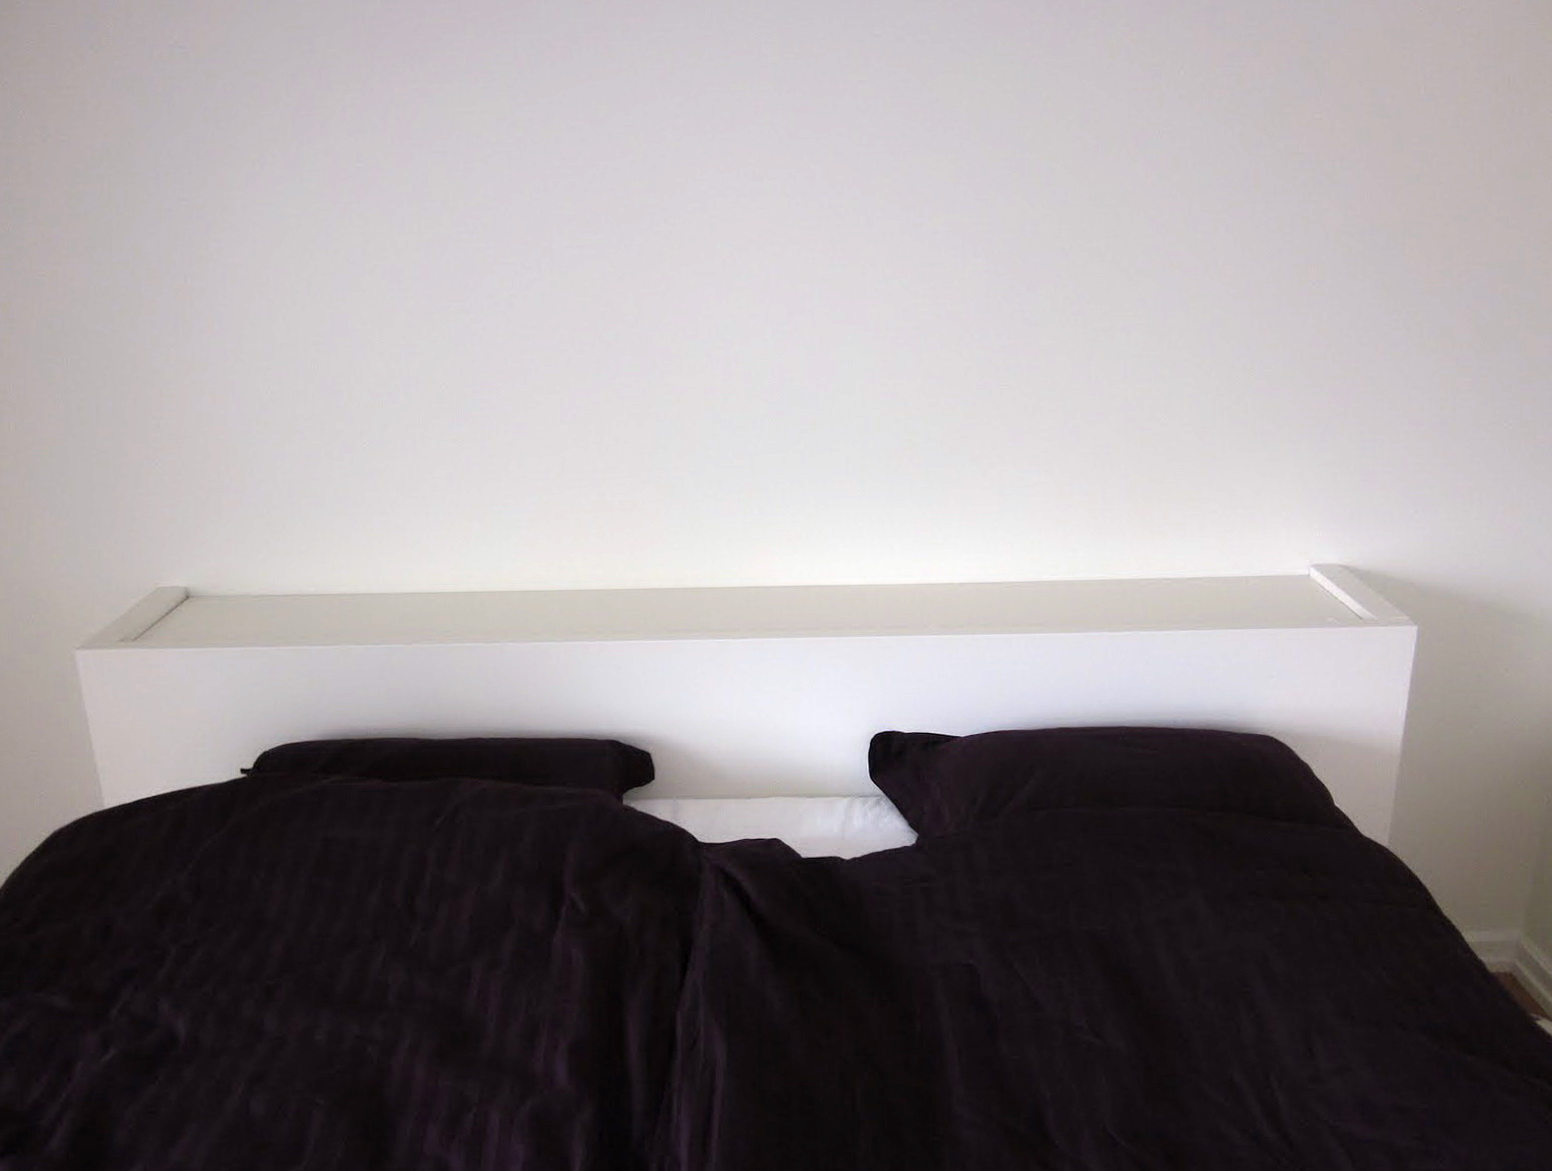 Ikea Malm Headboard Shelf